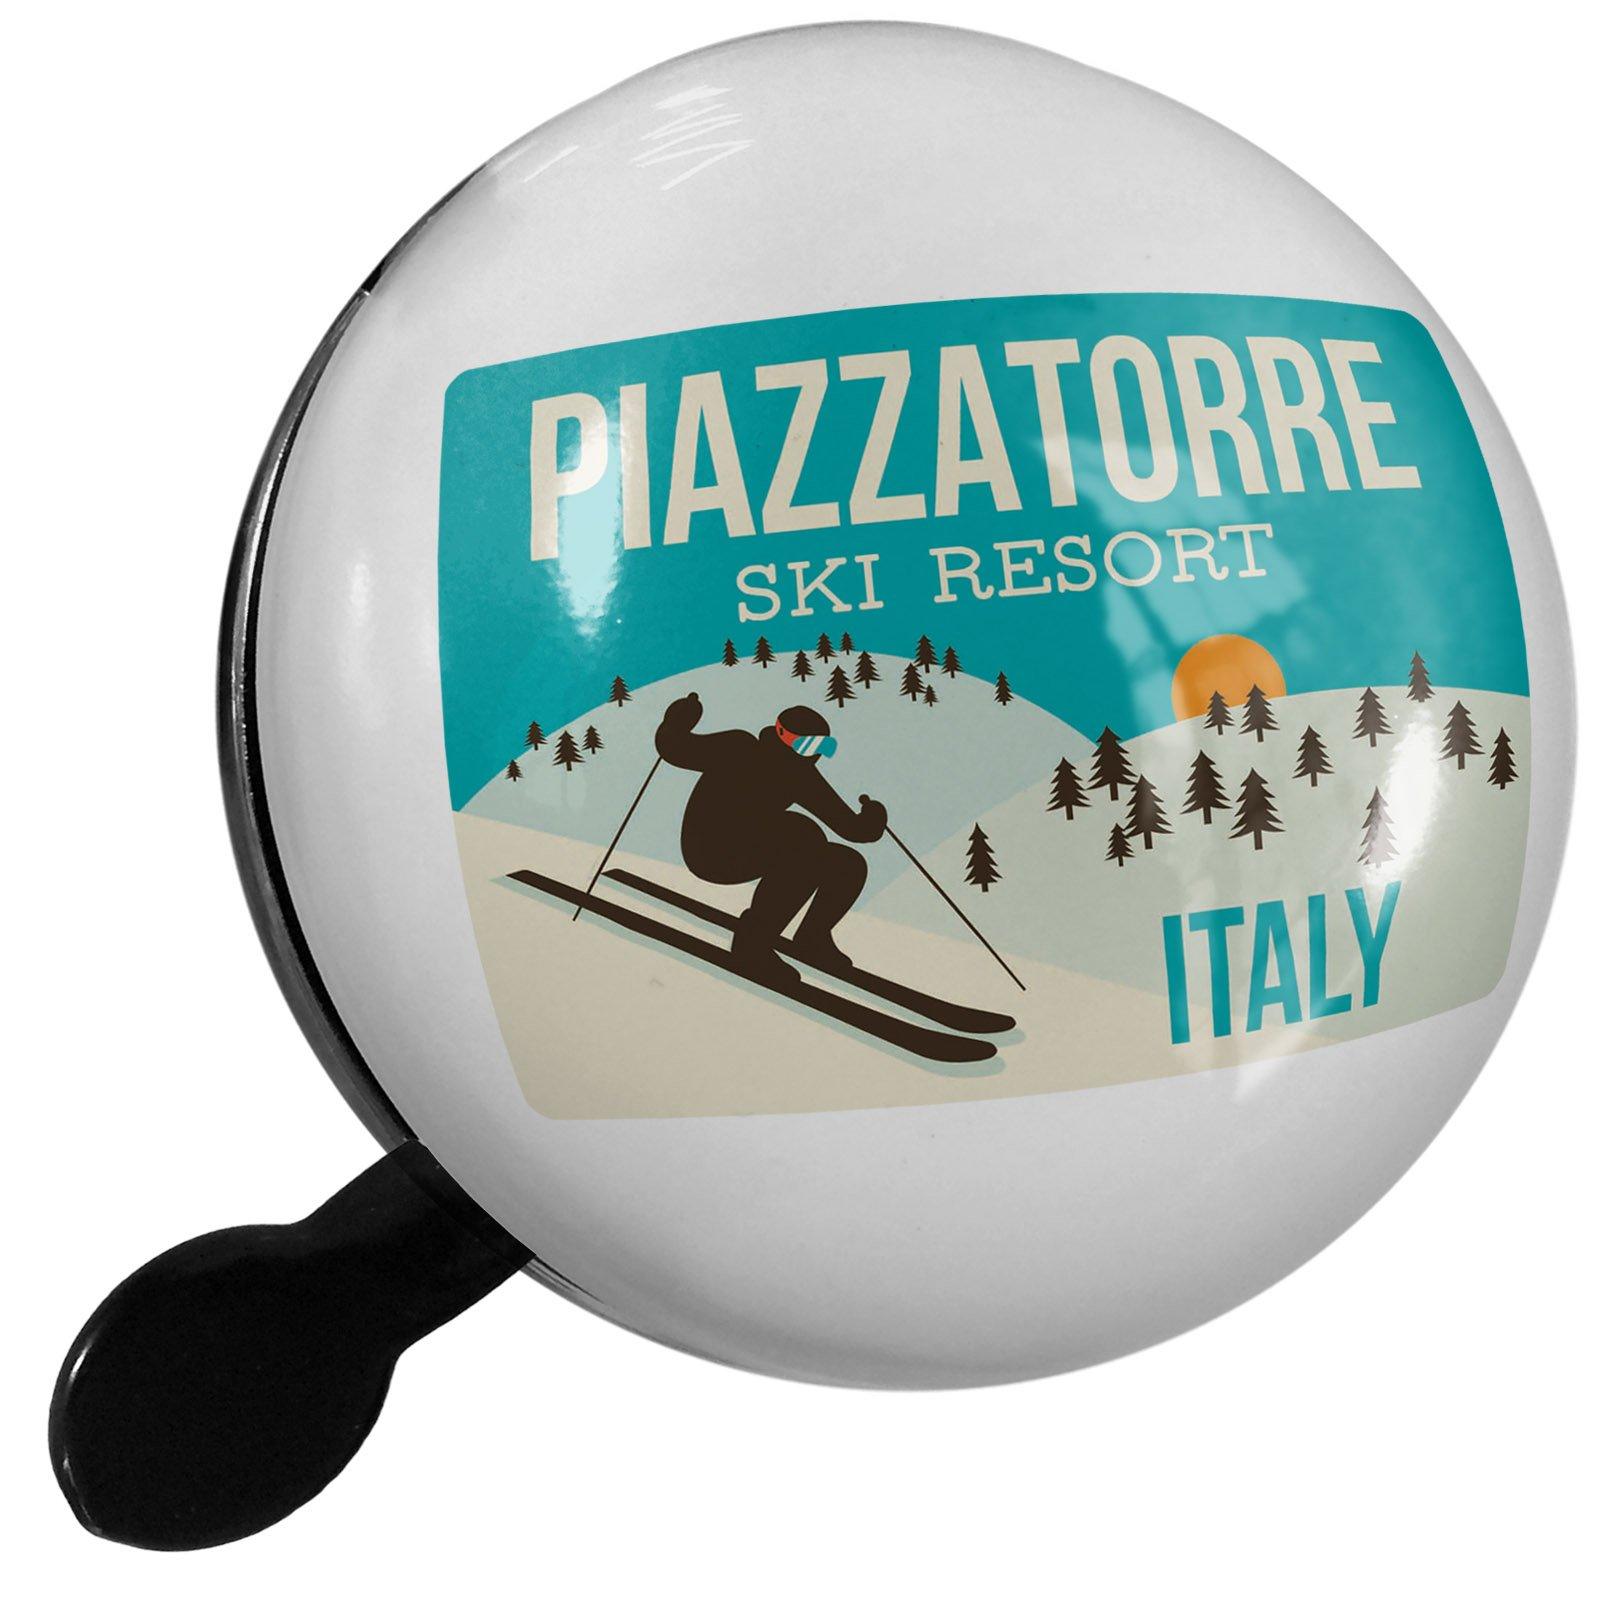 Small Bike Bell Piazzatorre Ski Resort - Italy Ski Resort - NEONBLOND